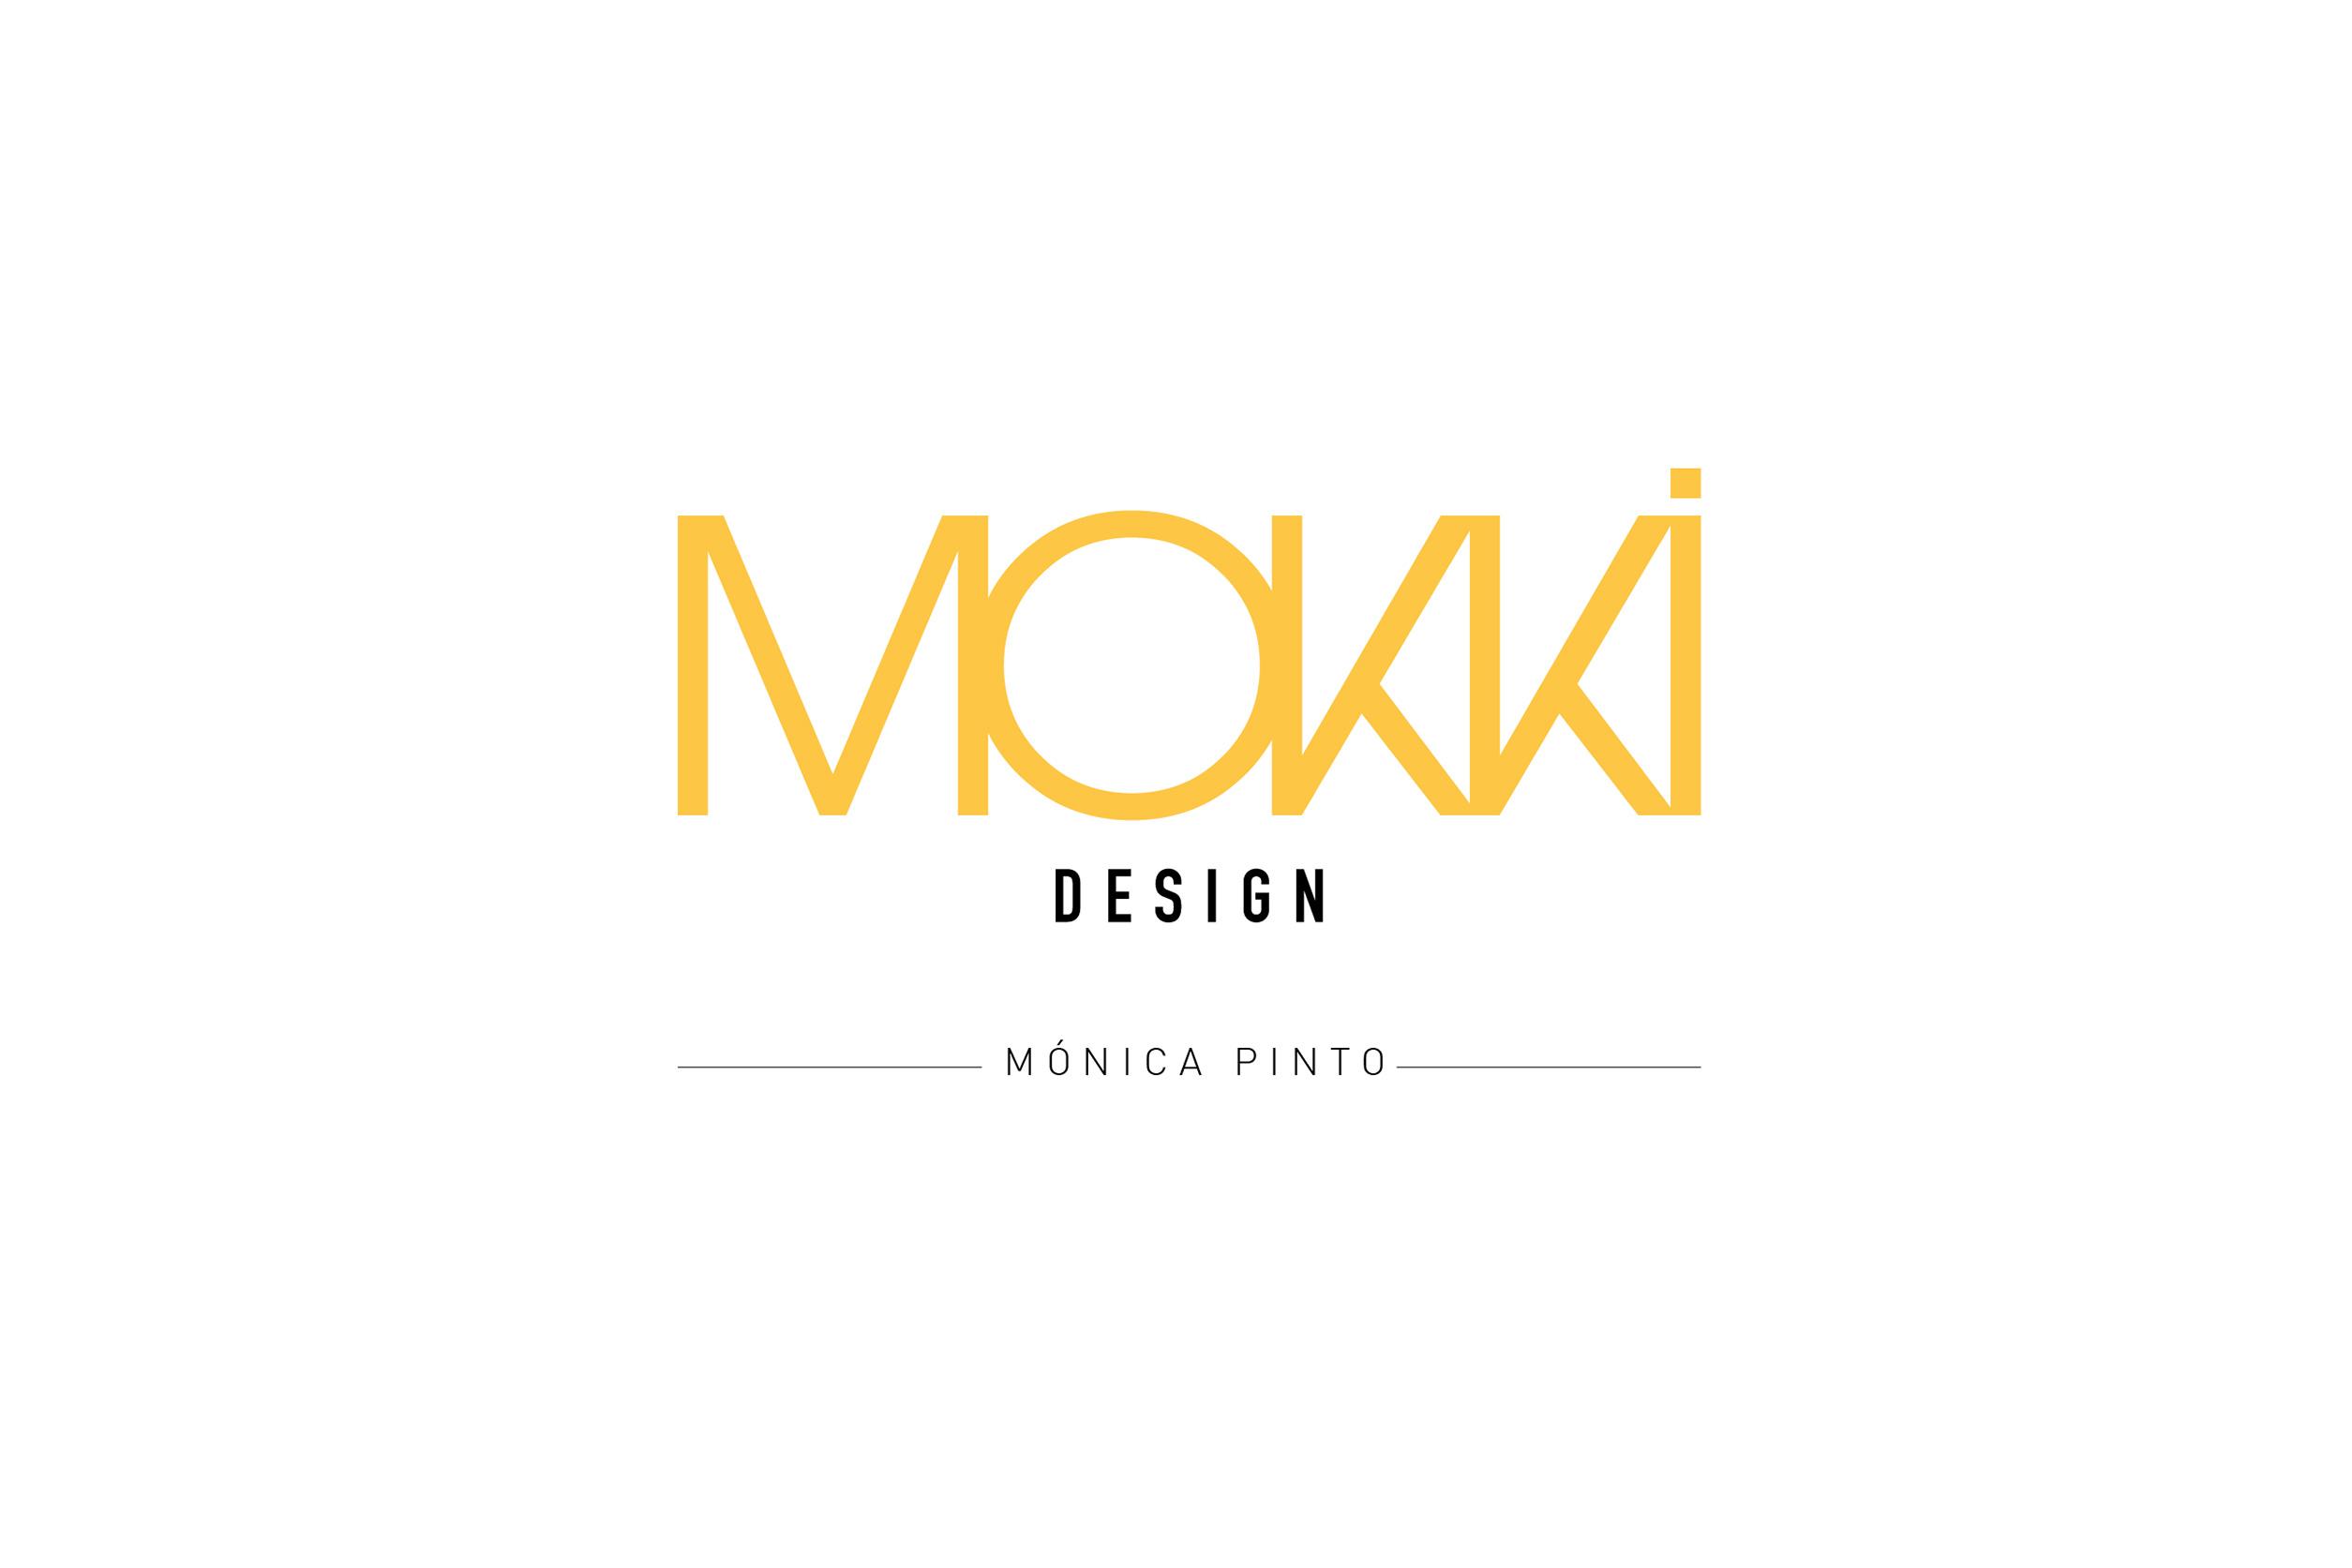 mokki-logo-logo